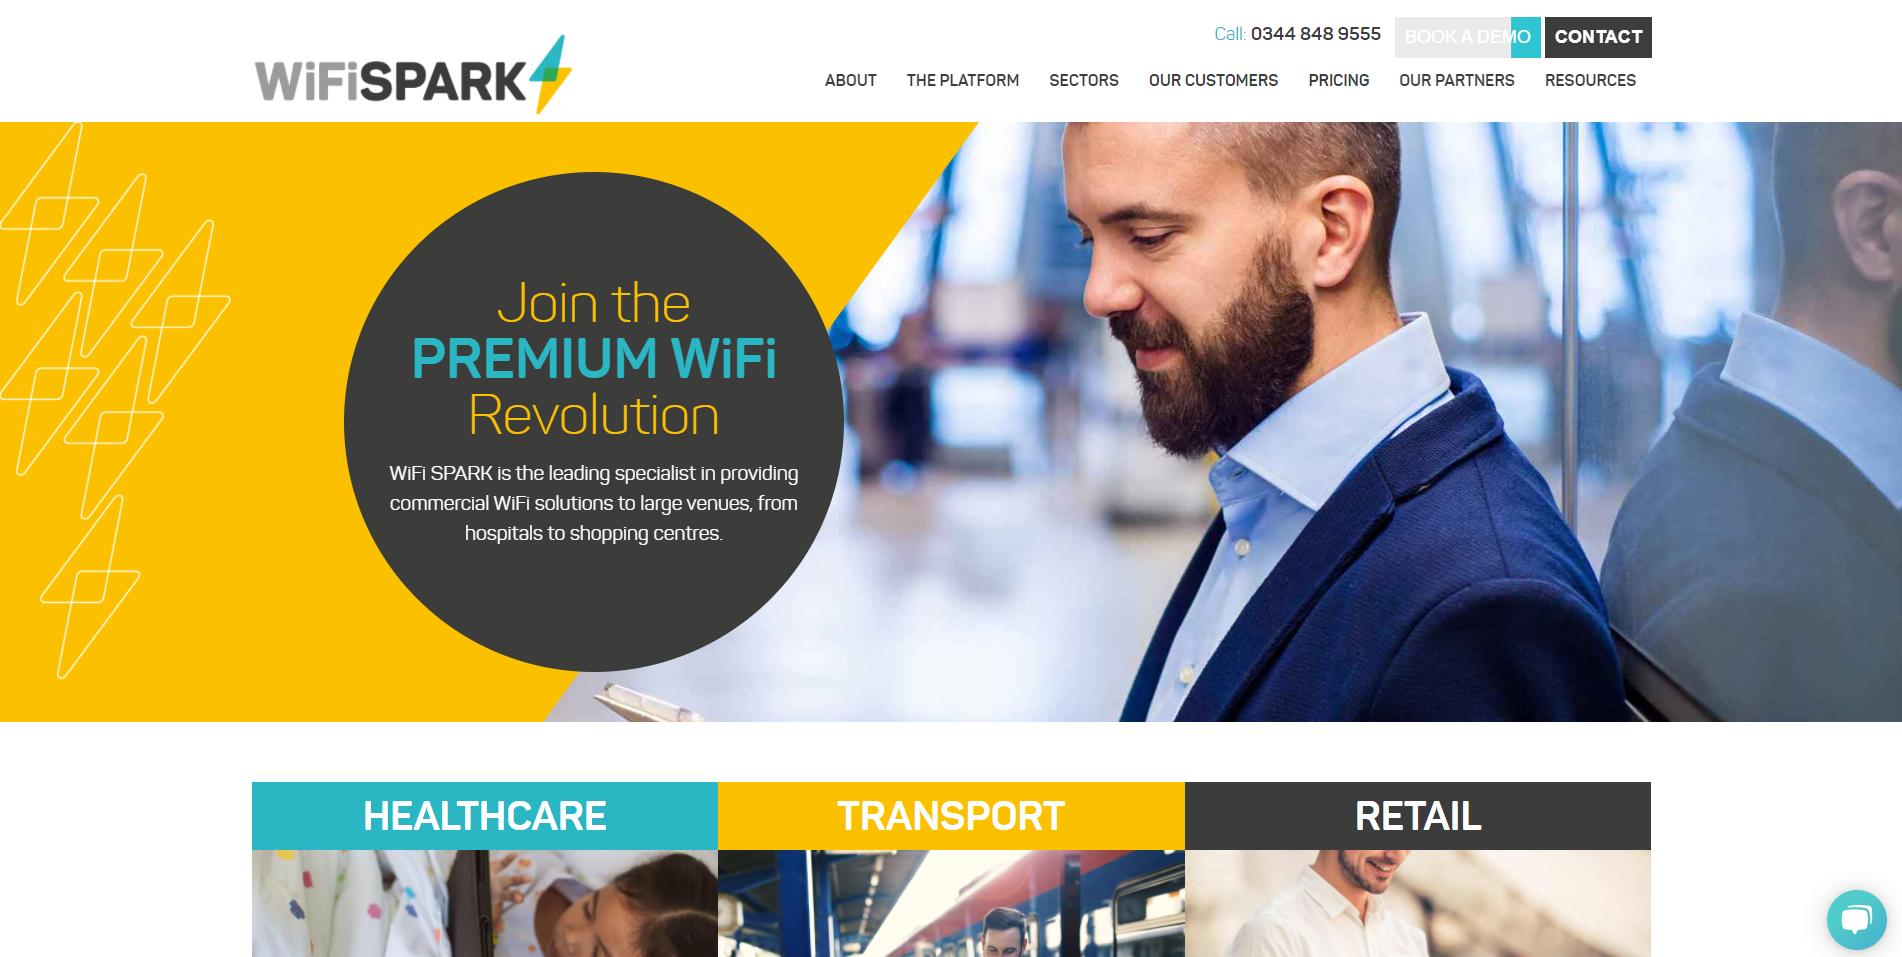 Wifi spark website example-1